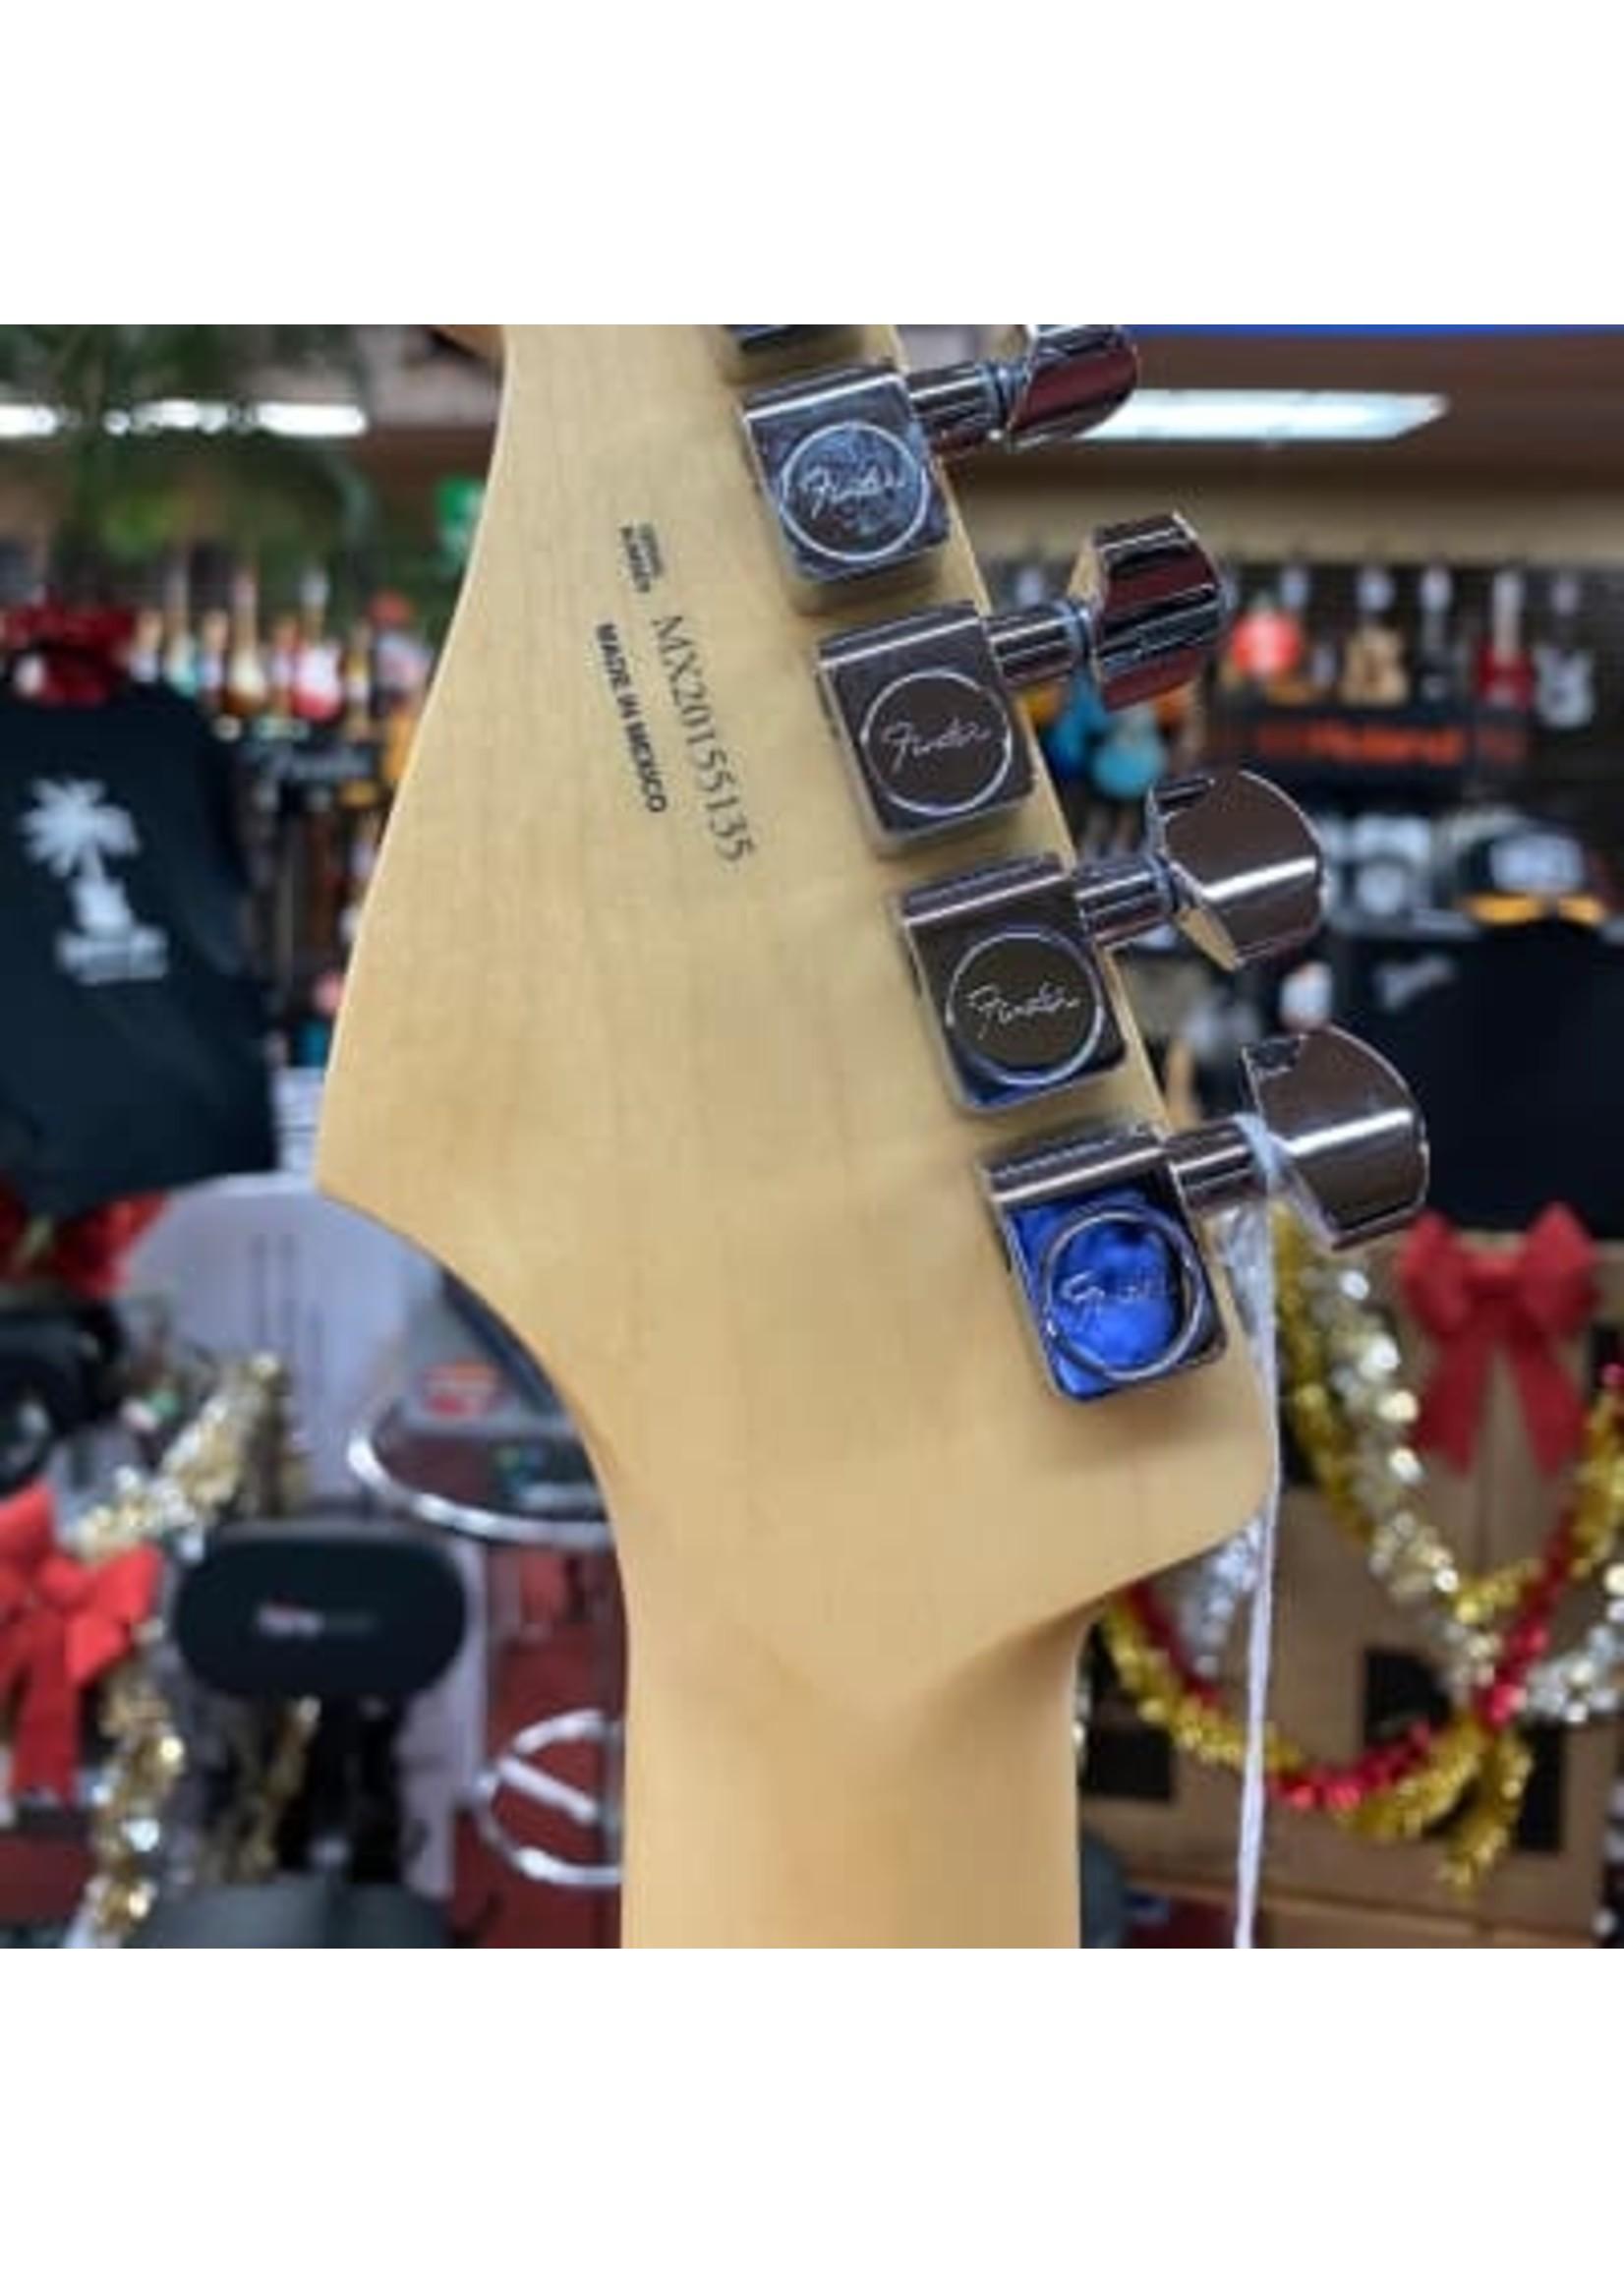 Fender Fender Players Stratocaster Silver